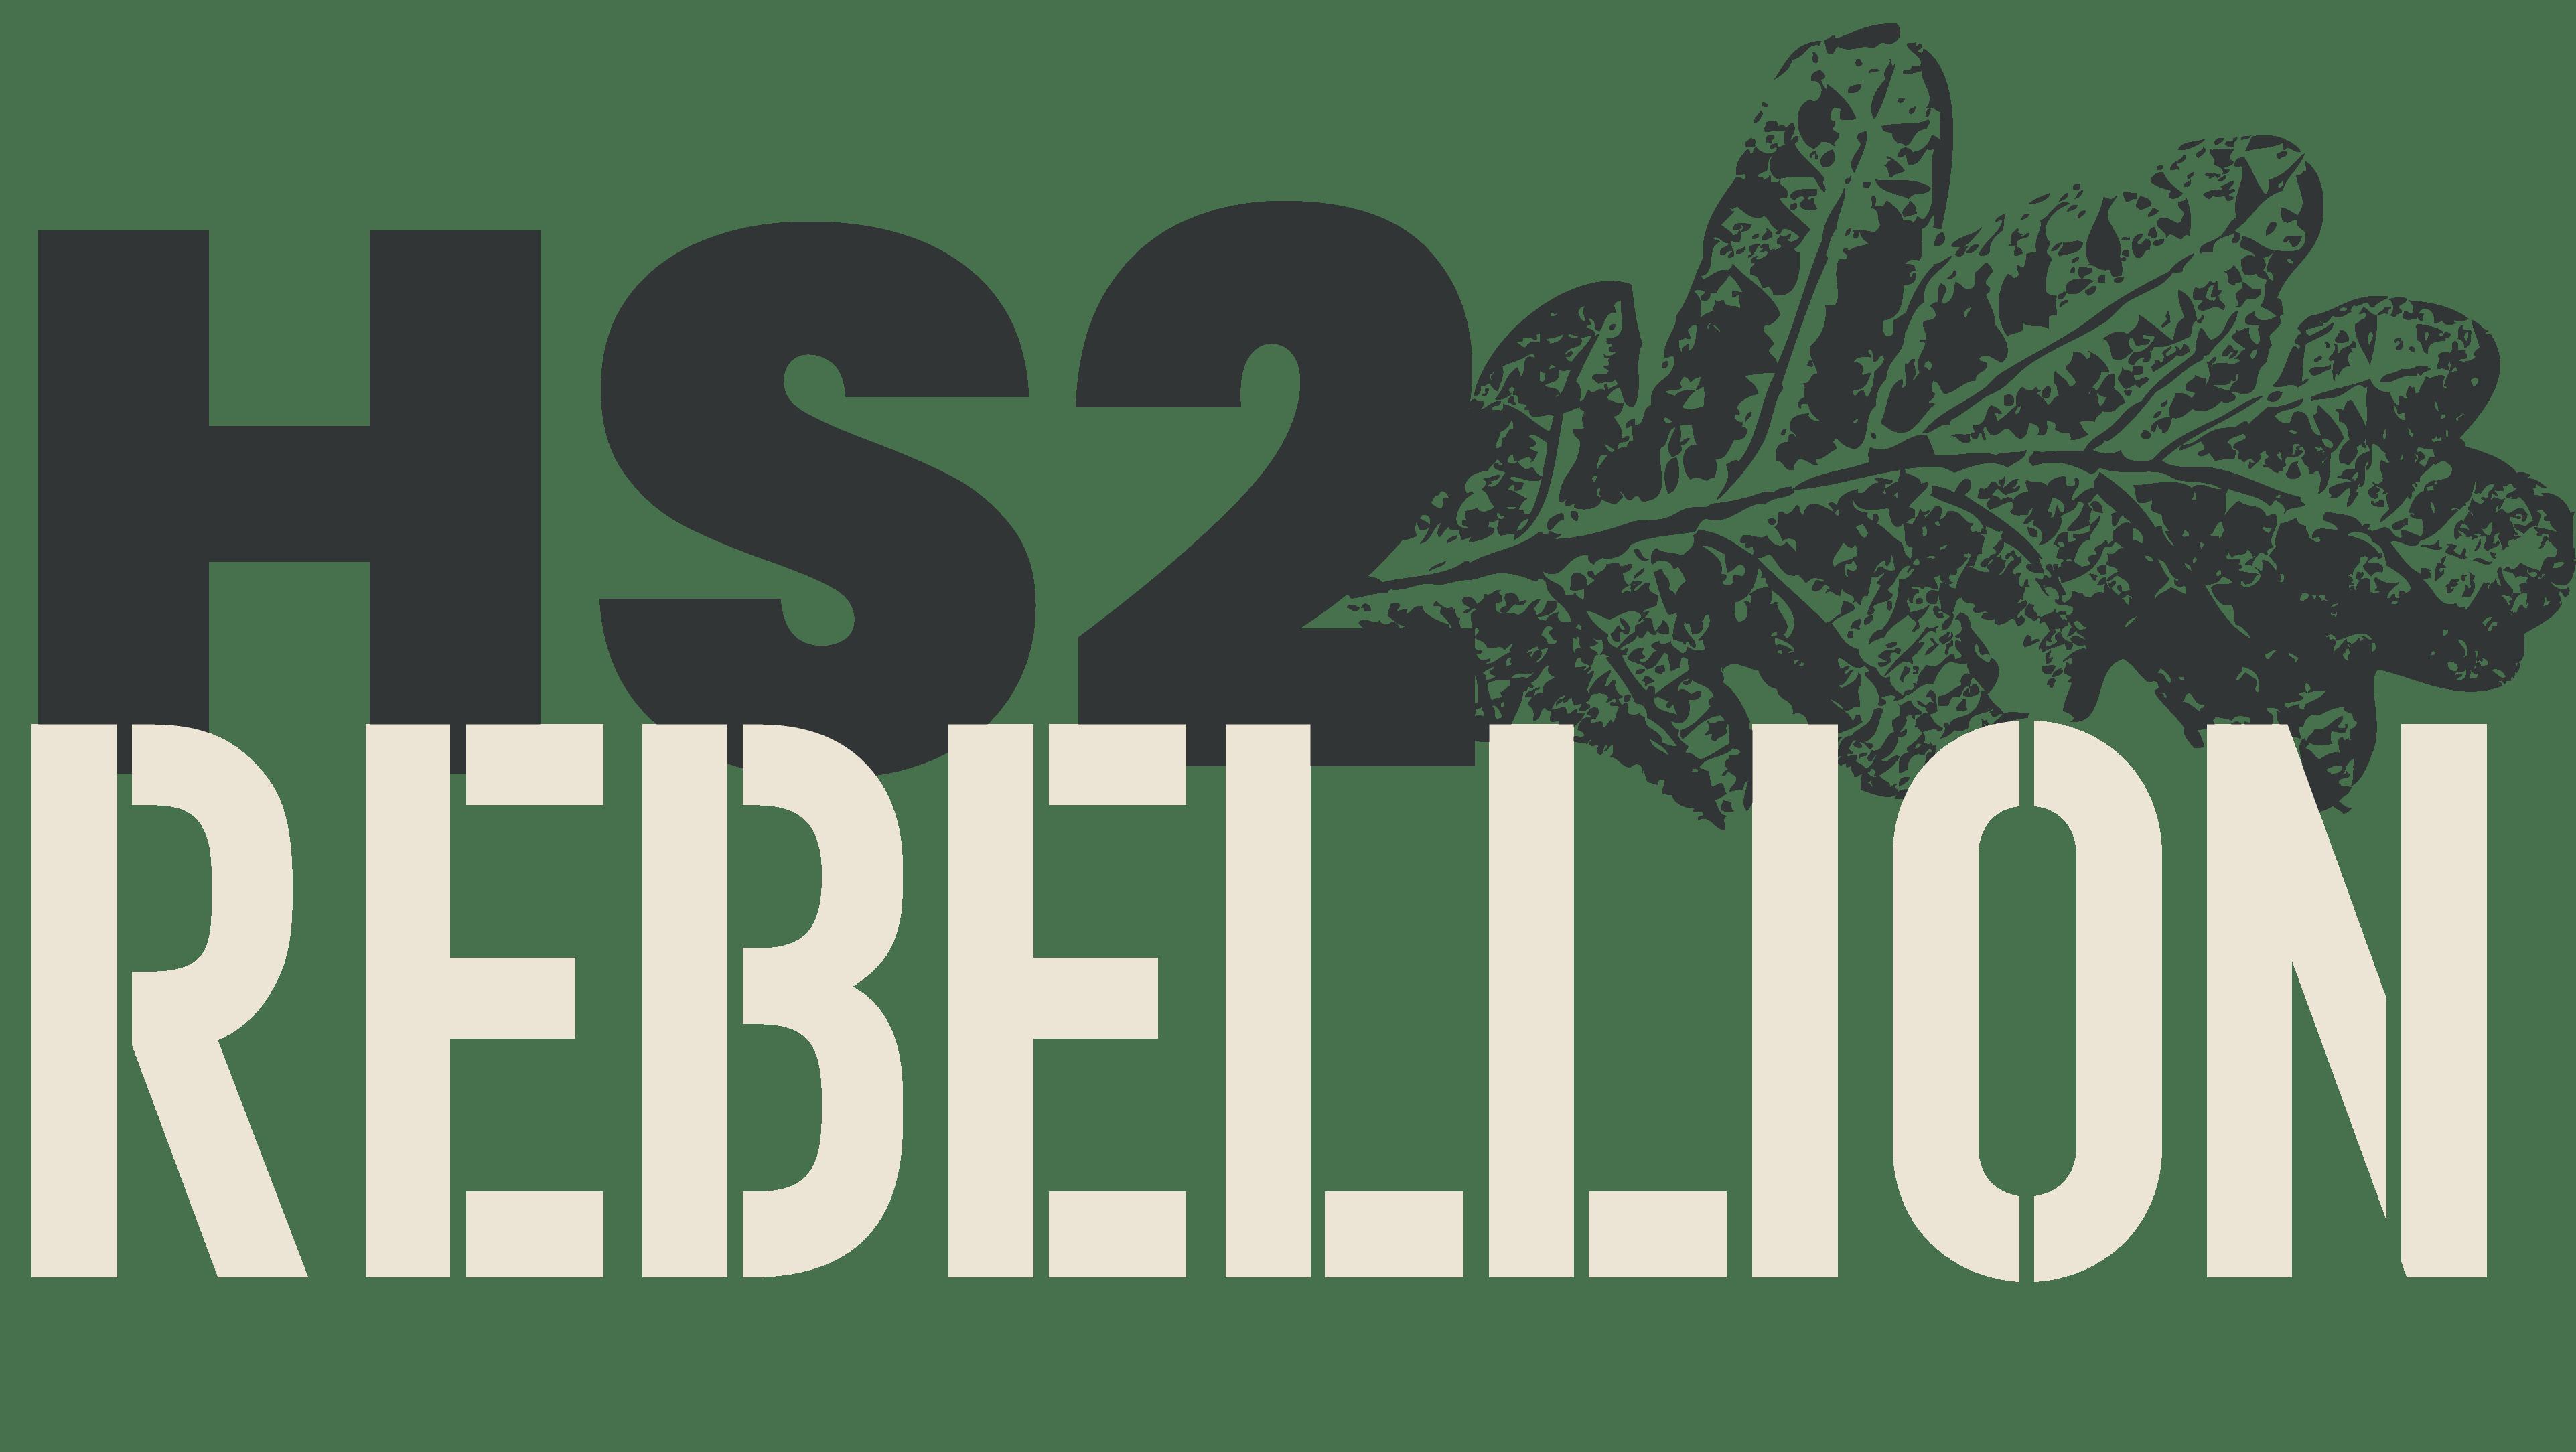 HS2 Rebellion